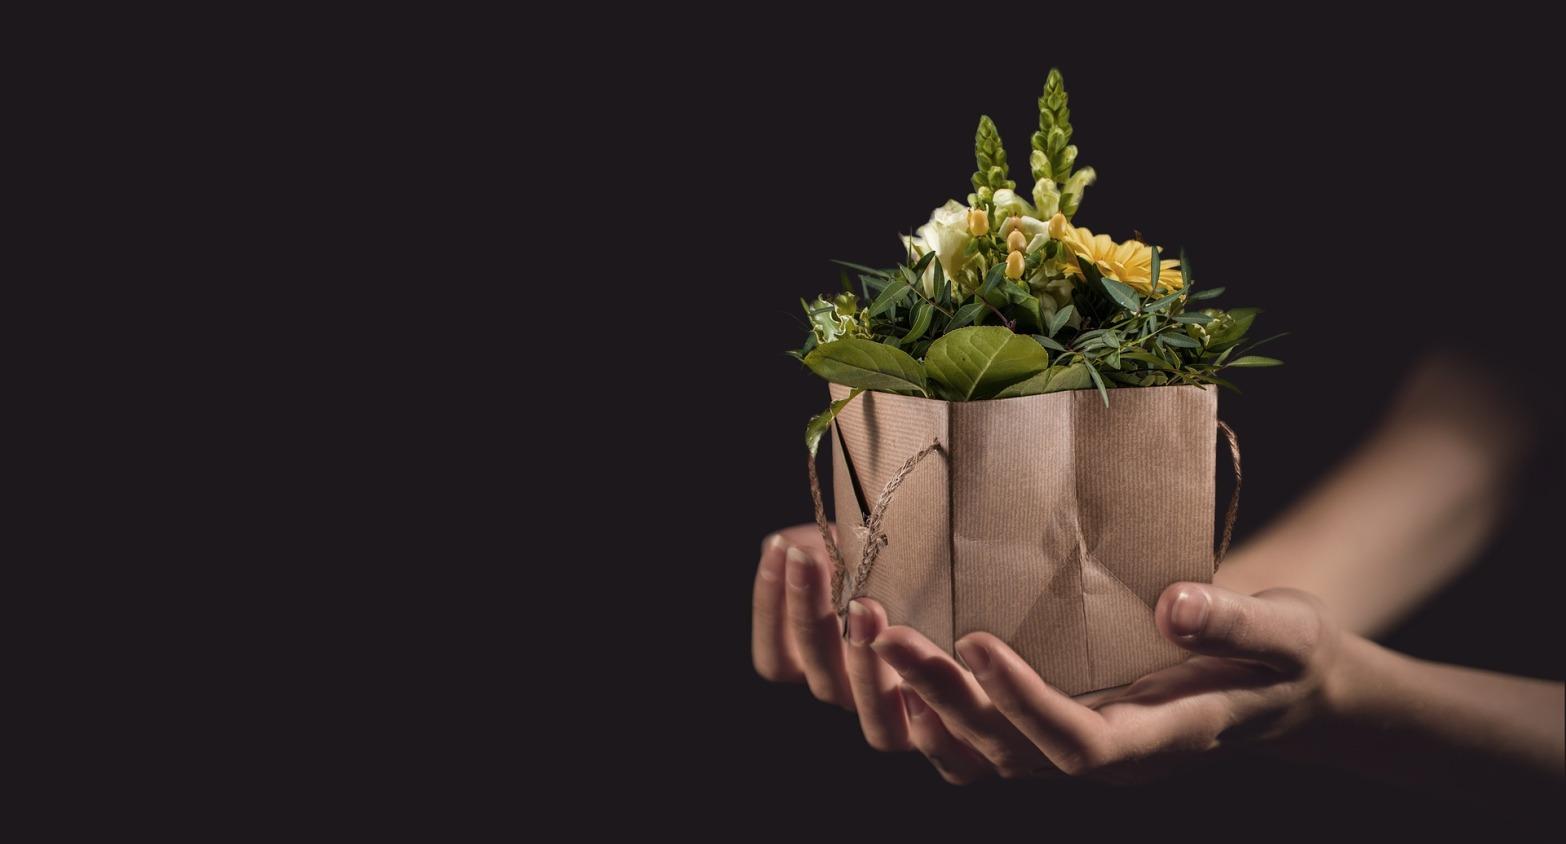 flowers-1338641_1920